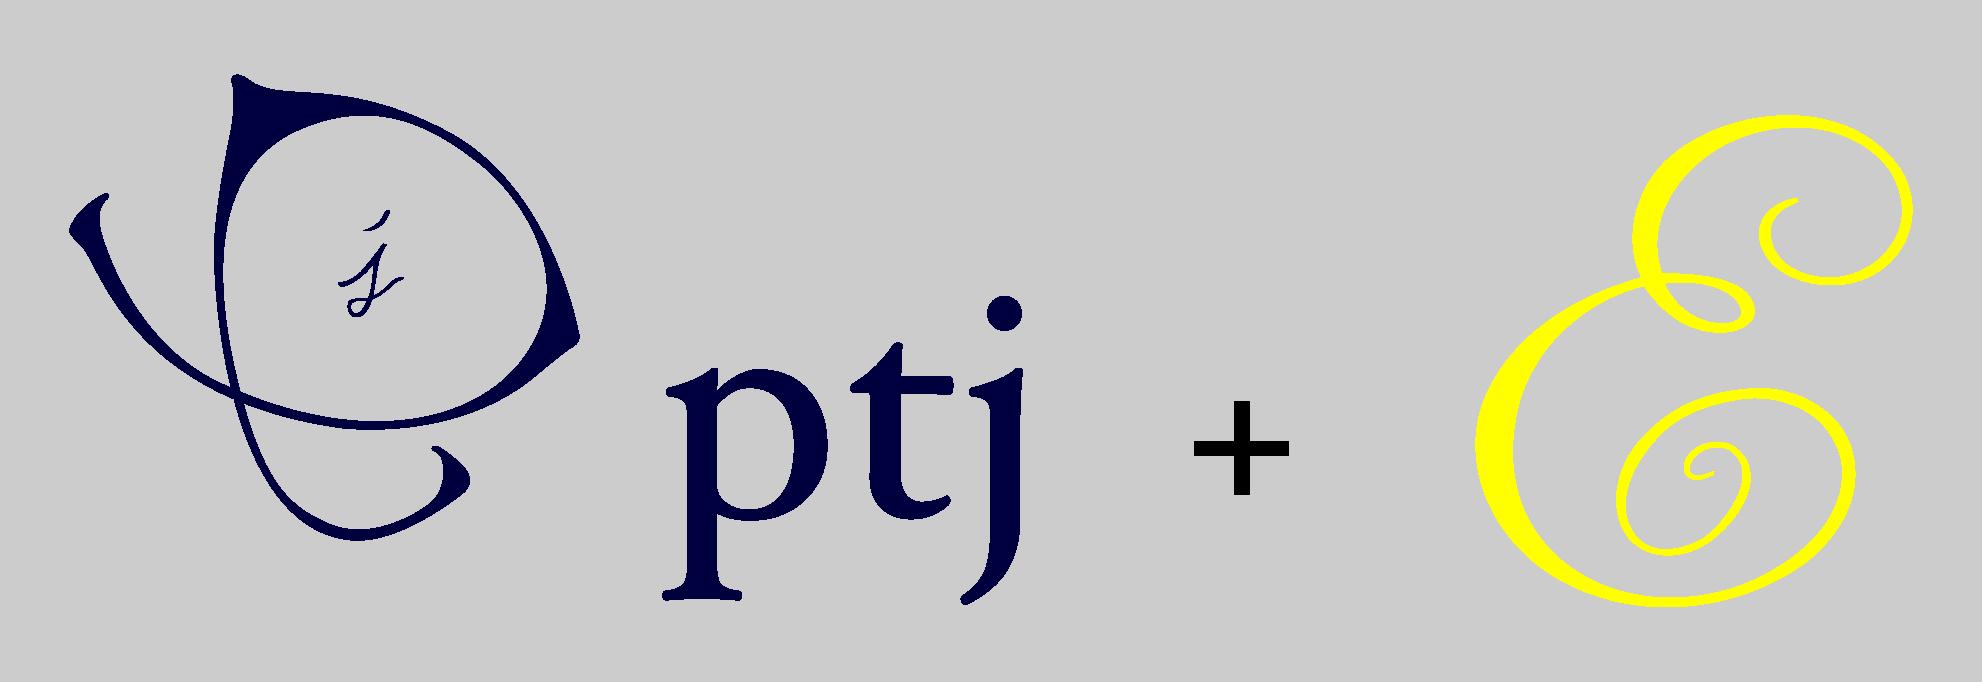 ptj + e   ペア、メンズへのギフトとLadysアクセサリー、雑貨の販売サイト